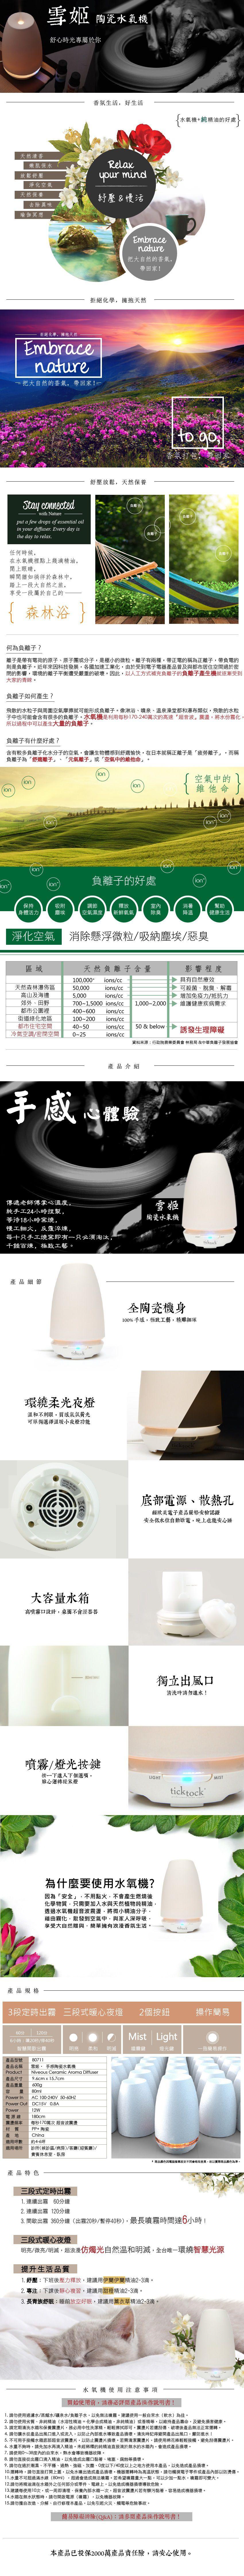 TickTock 雪姬手感陶瓷水氧機